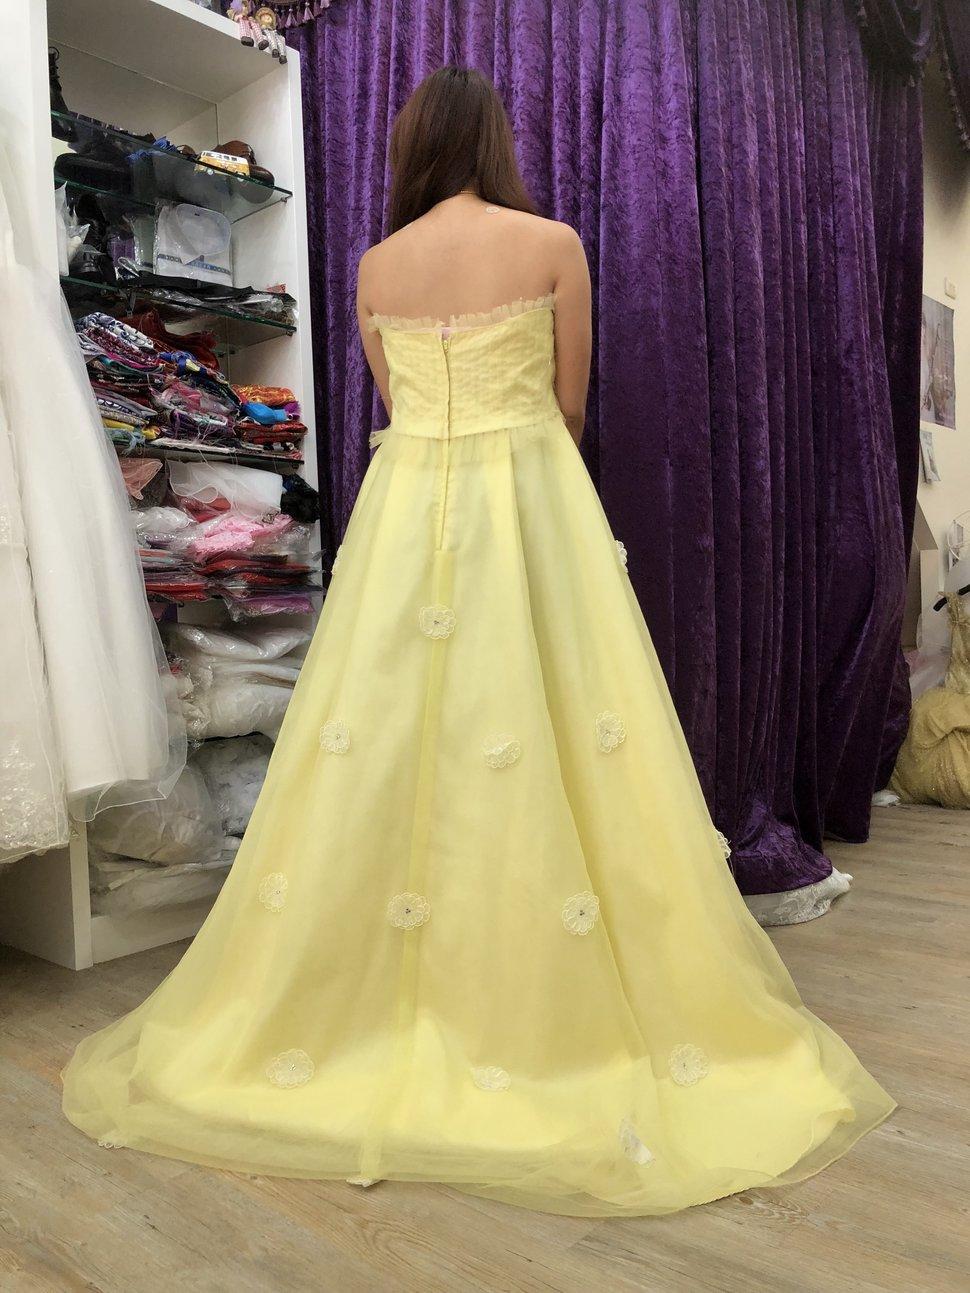 IMG_5969 - 全台最便宜-45DESIGN四五婚紗禮服《結婚吧》